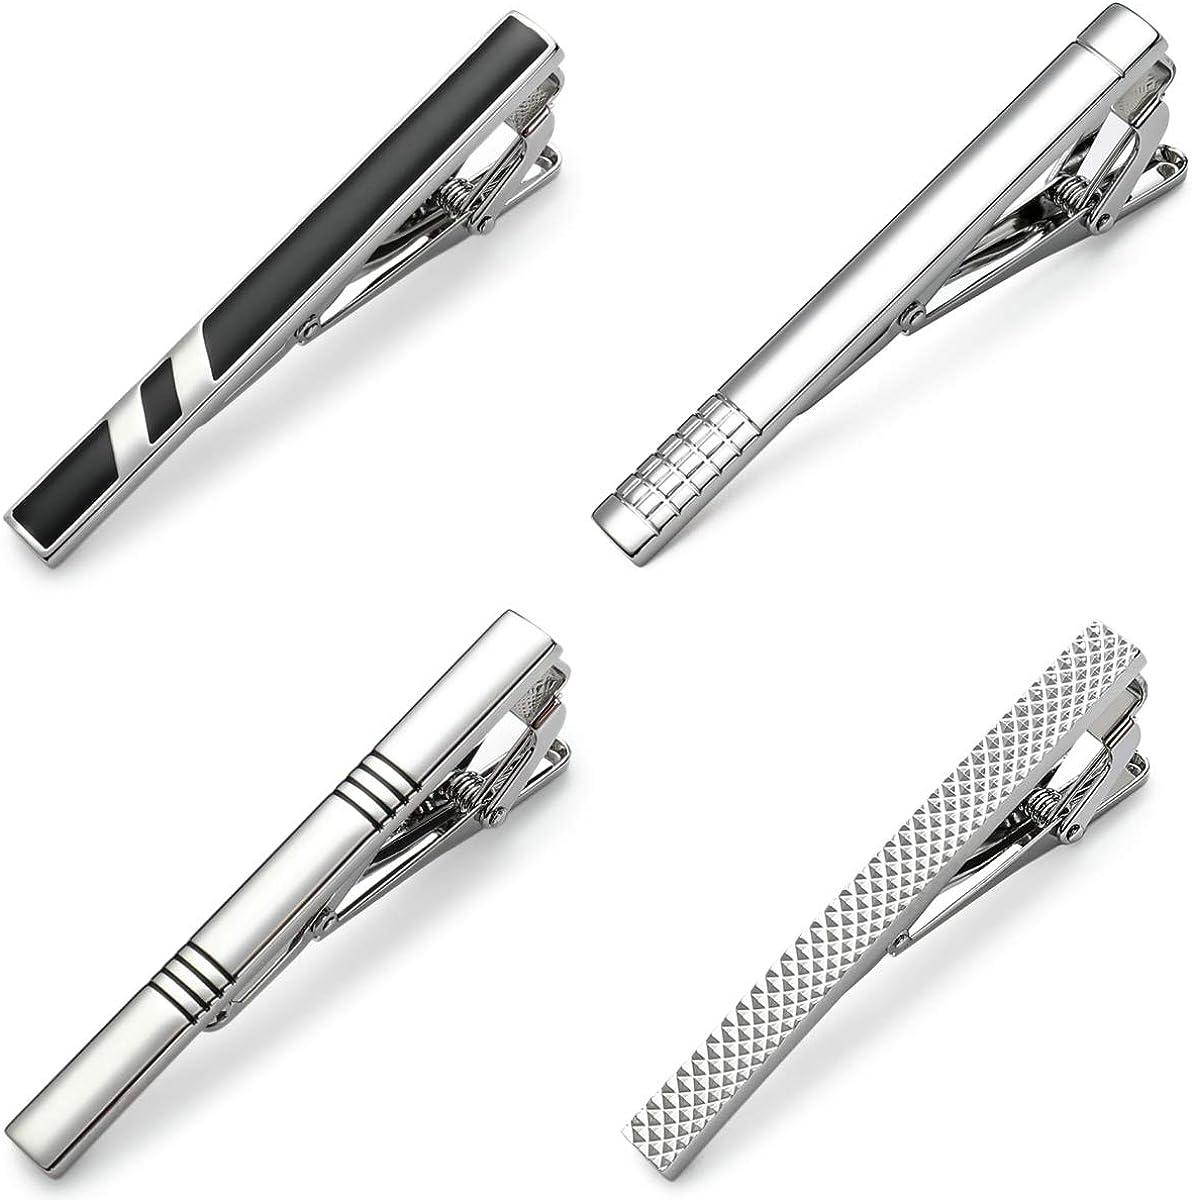 MOZETO Tie Clip, Classic Business Style Tie Clips for Men, Luxury 4pcs Tie Bar Gift Box Set for Regular Necktie